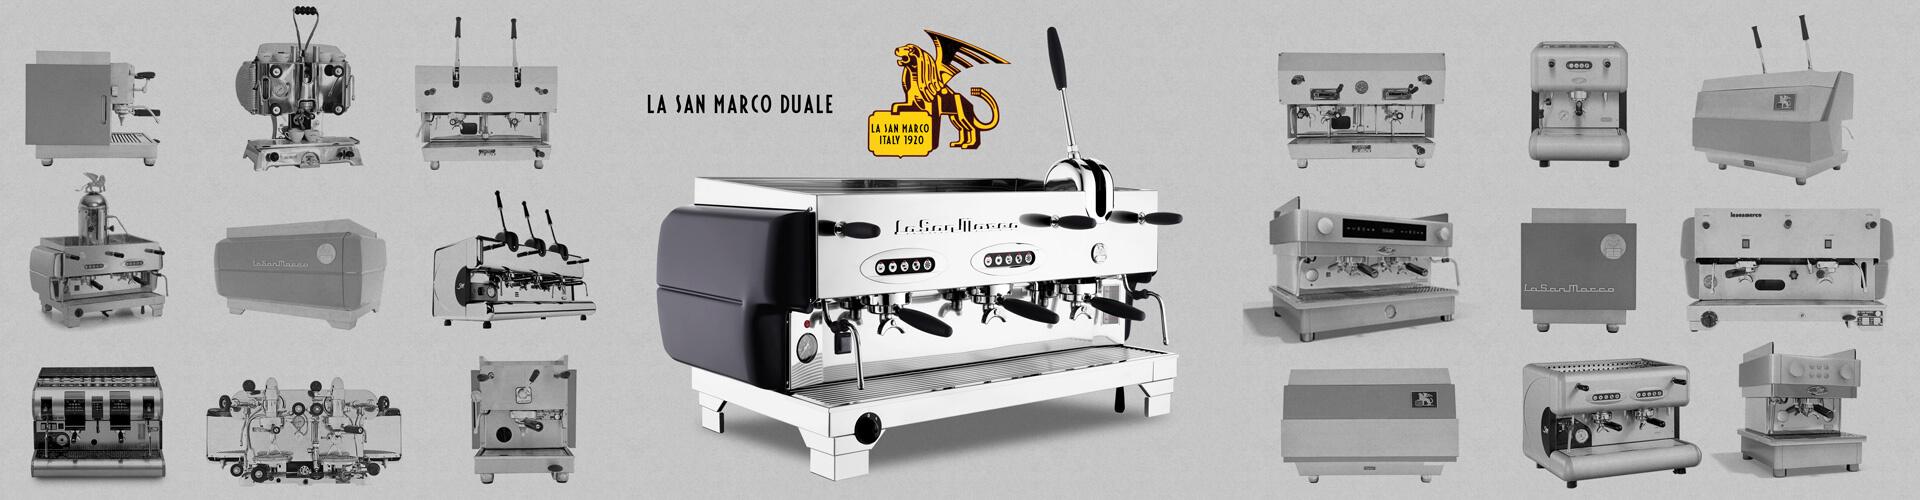 Espresso-art-slide-bw Our Coffee Machines